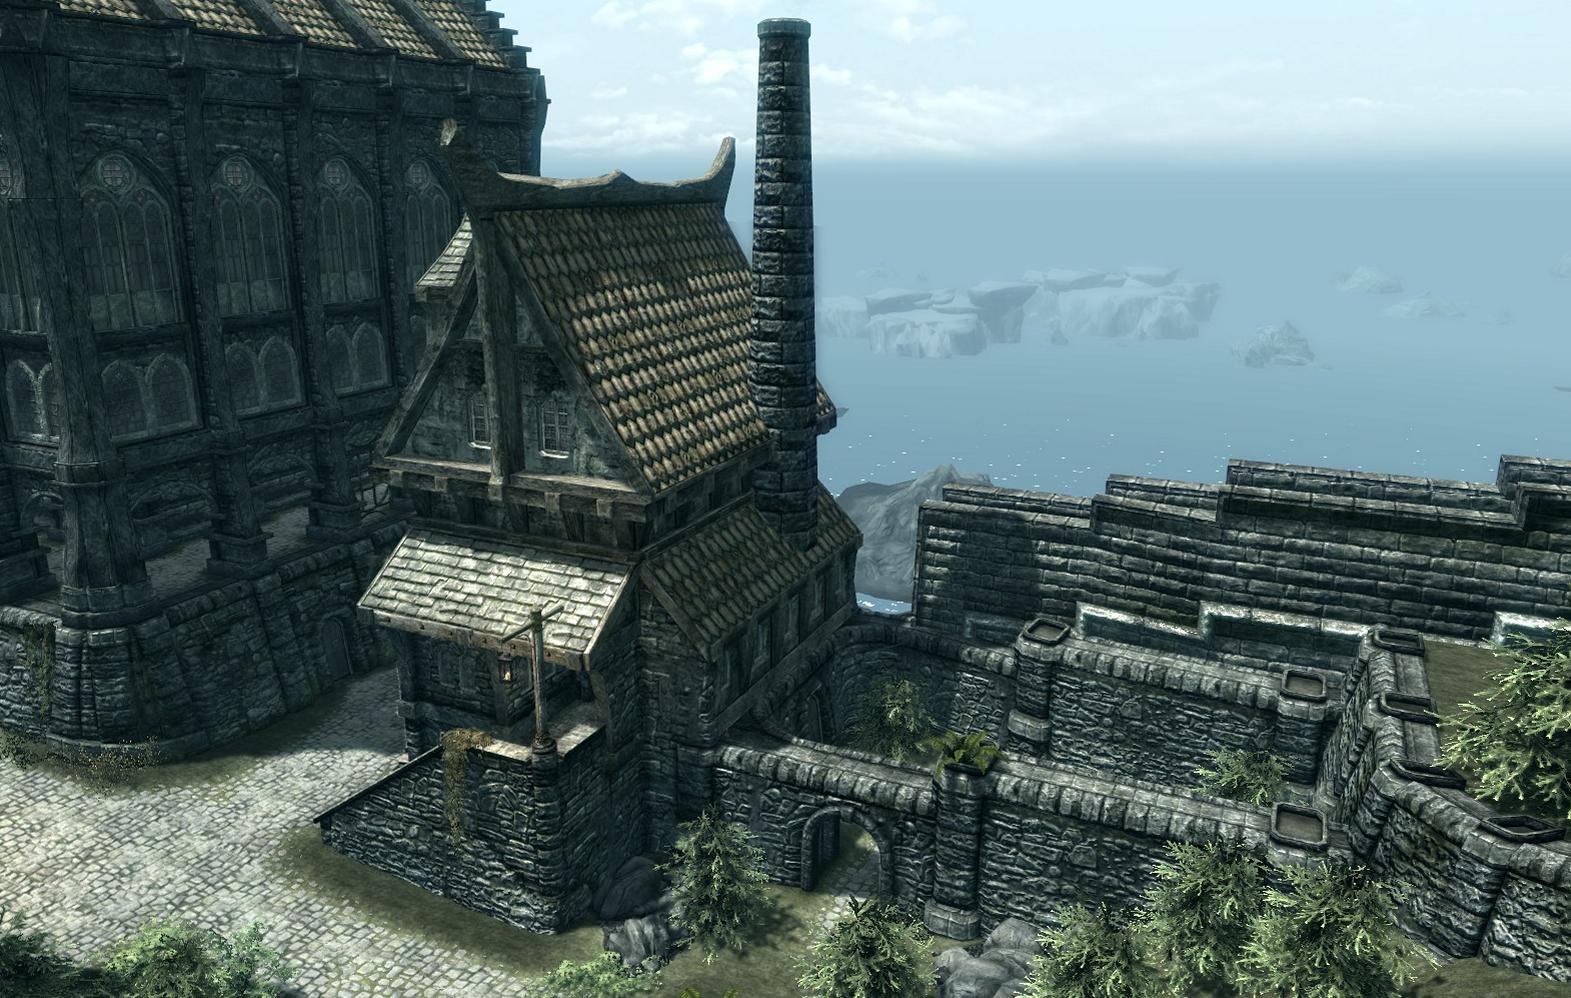 Brylingu0027s House